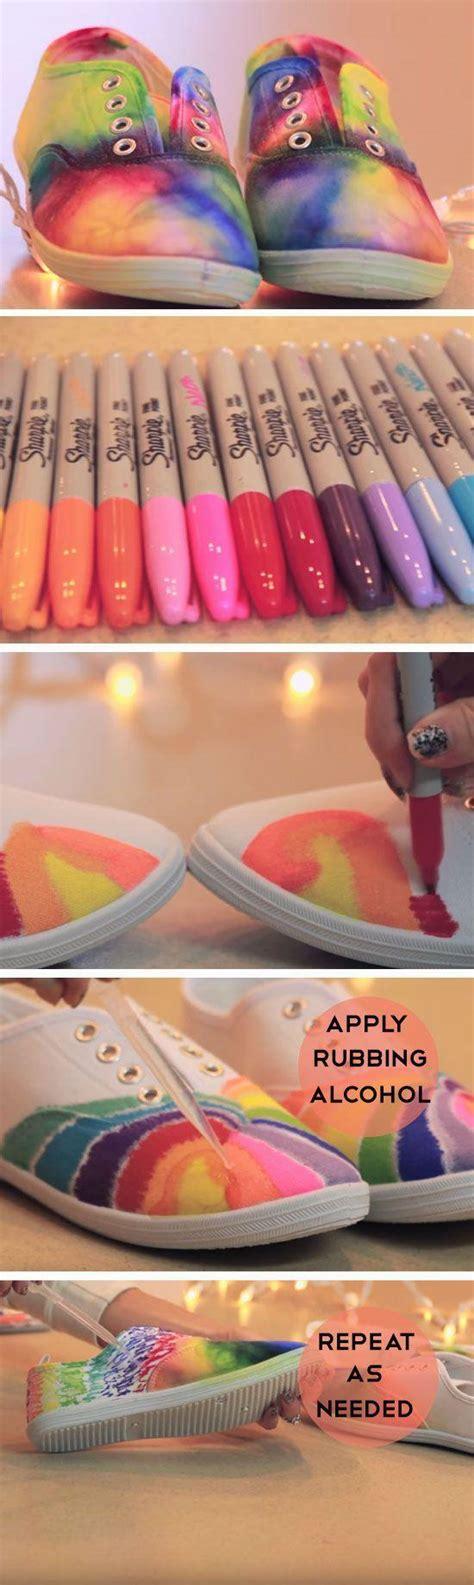 easy summer crafts for to make diy 23 easy summer crafts for to make 2540741